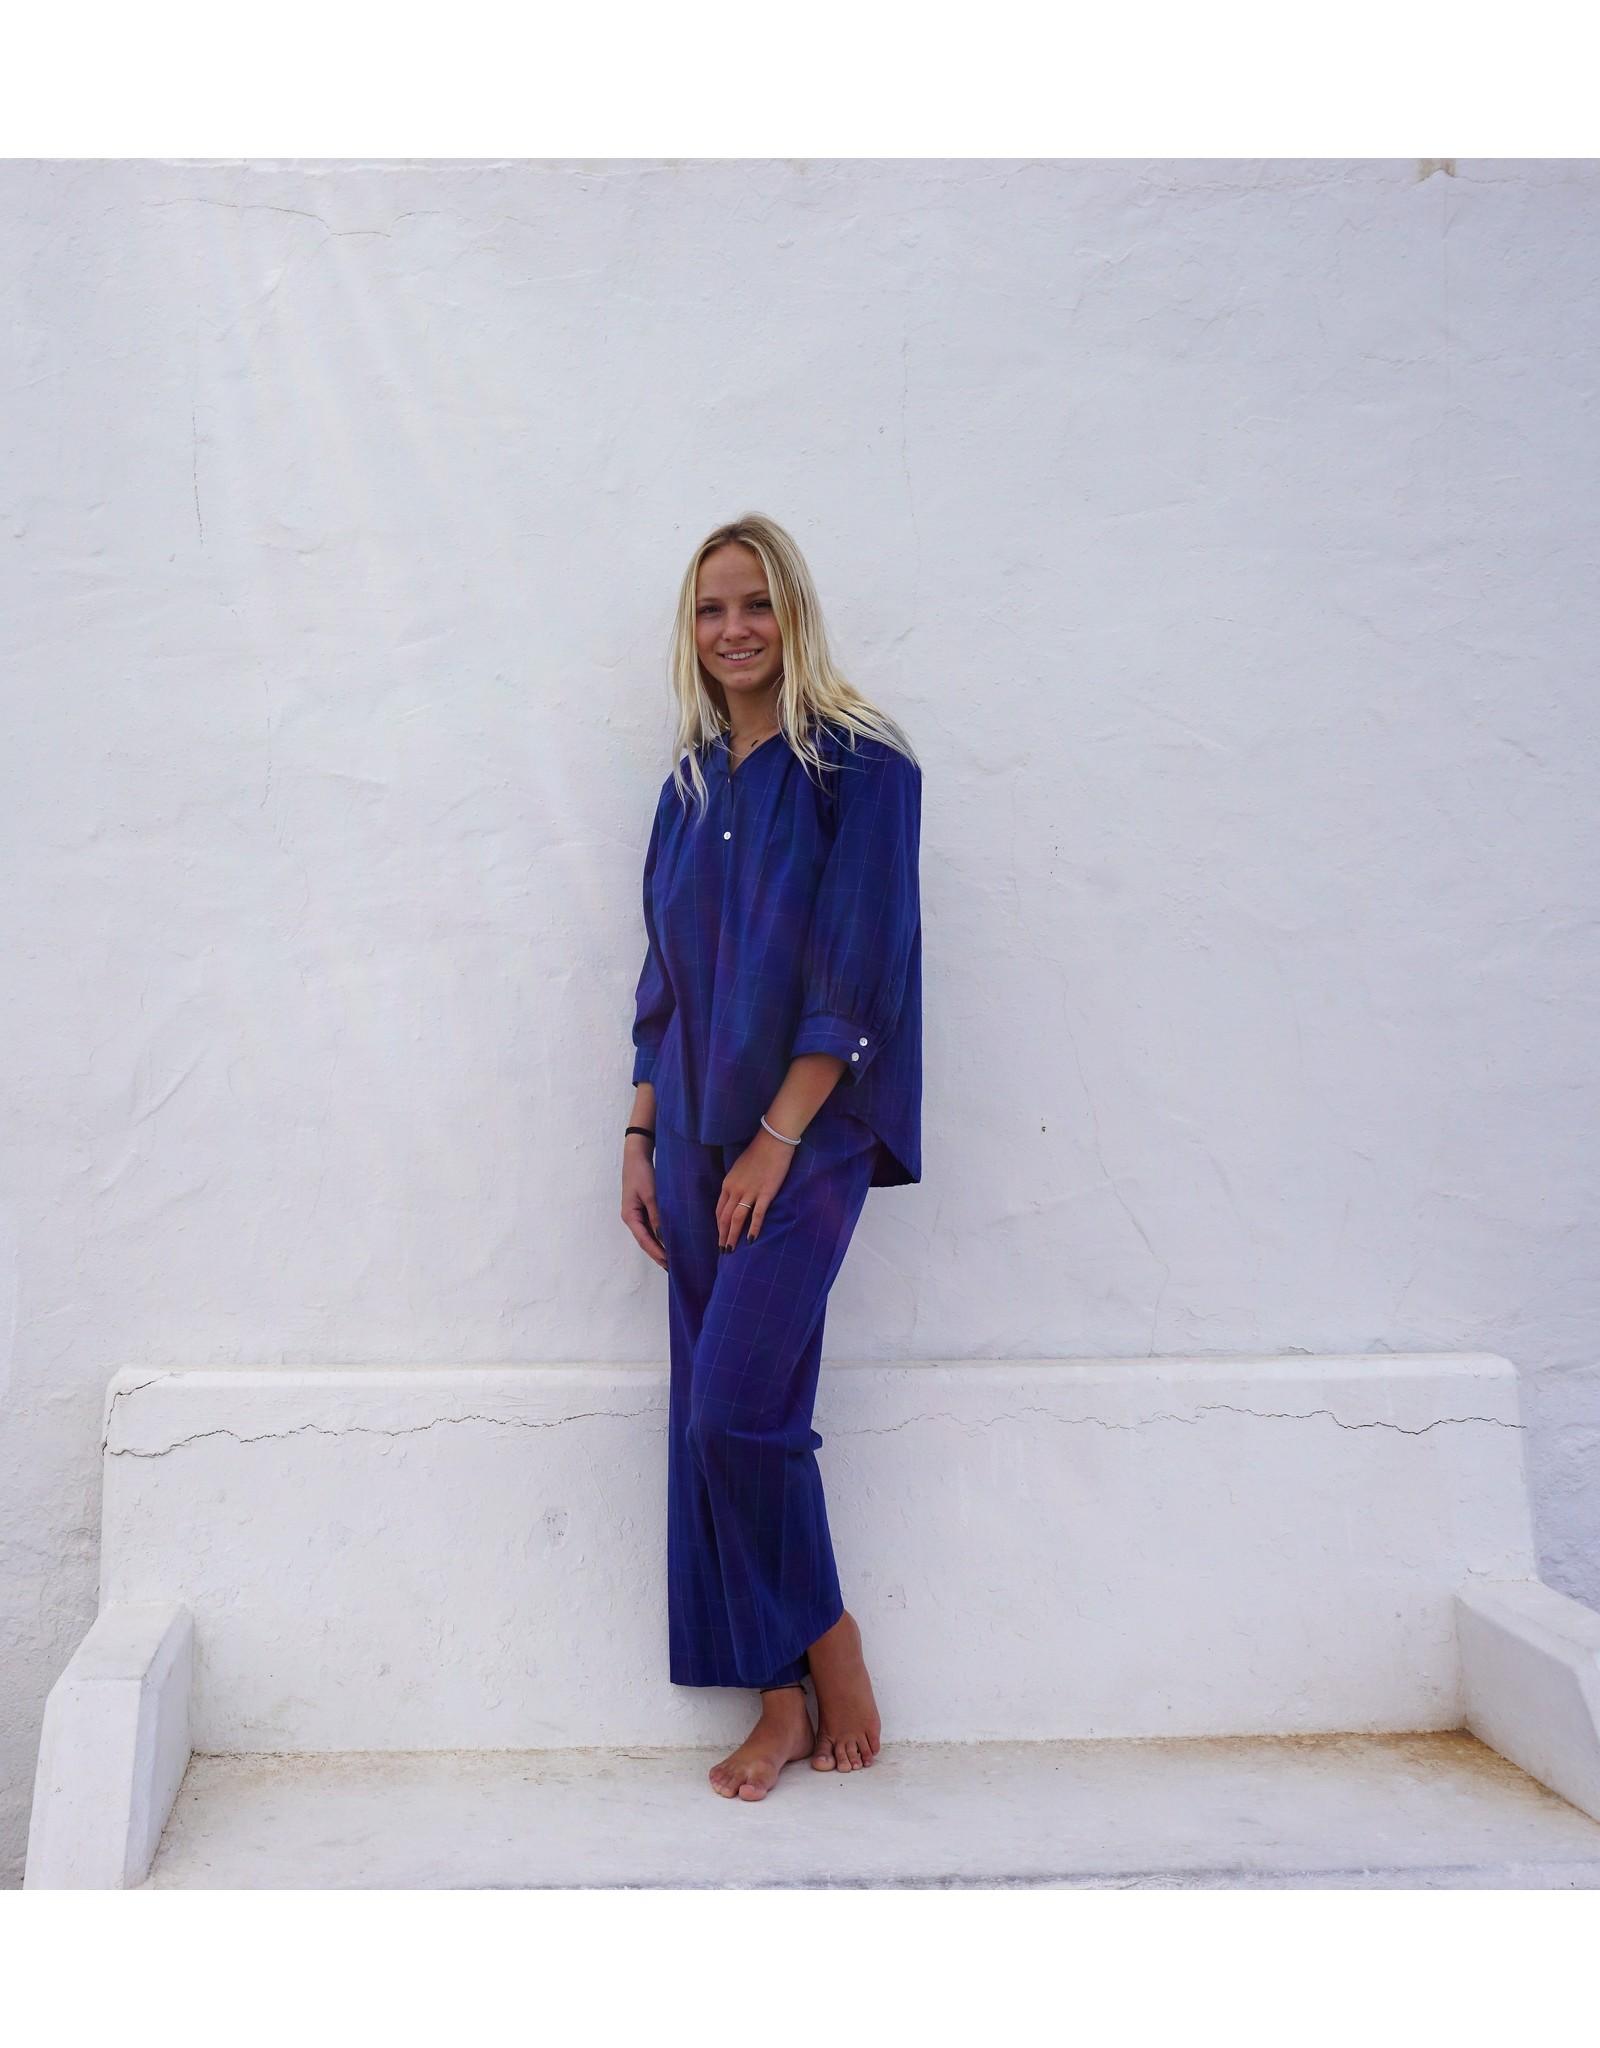 Dorélit Elly + Alkes | Pajama Set Woven | Check Blue